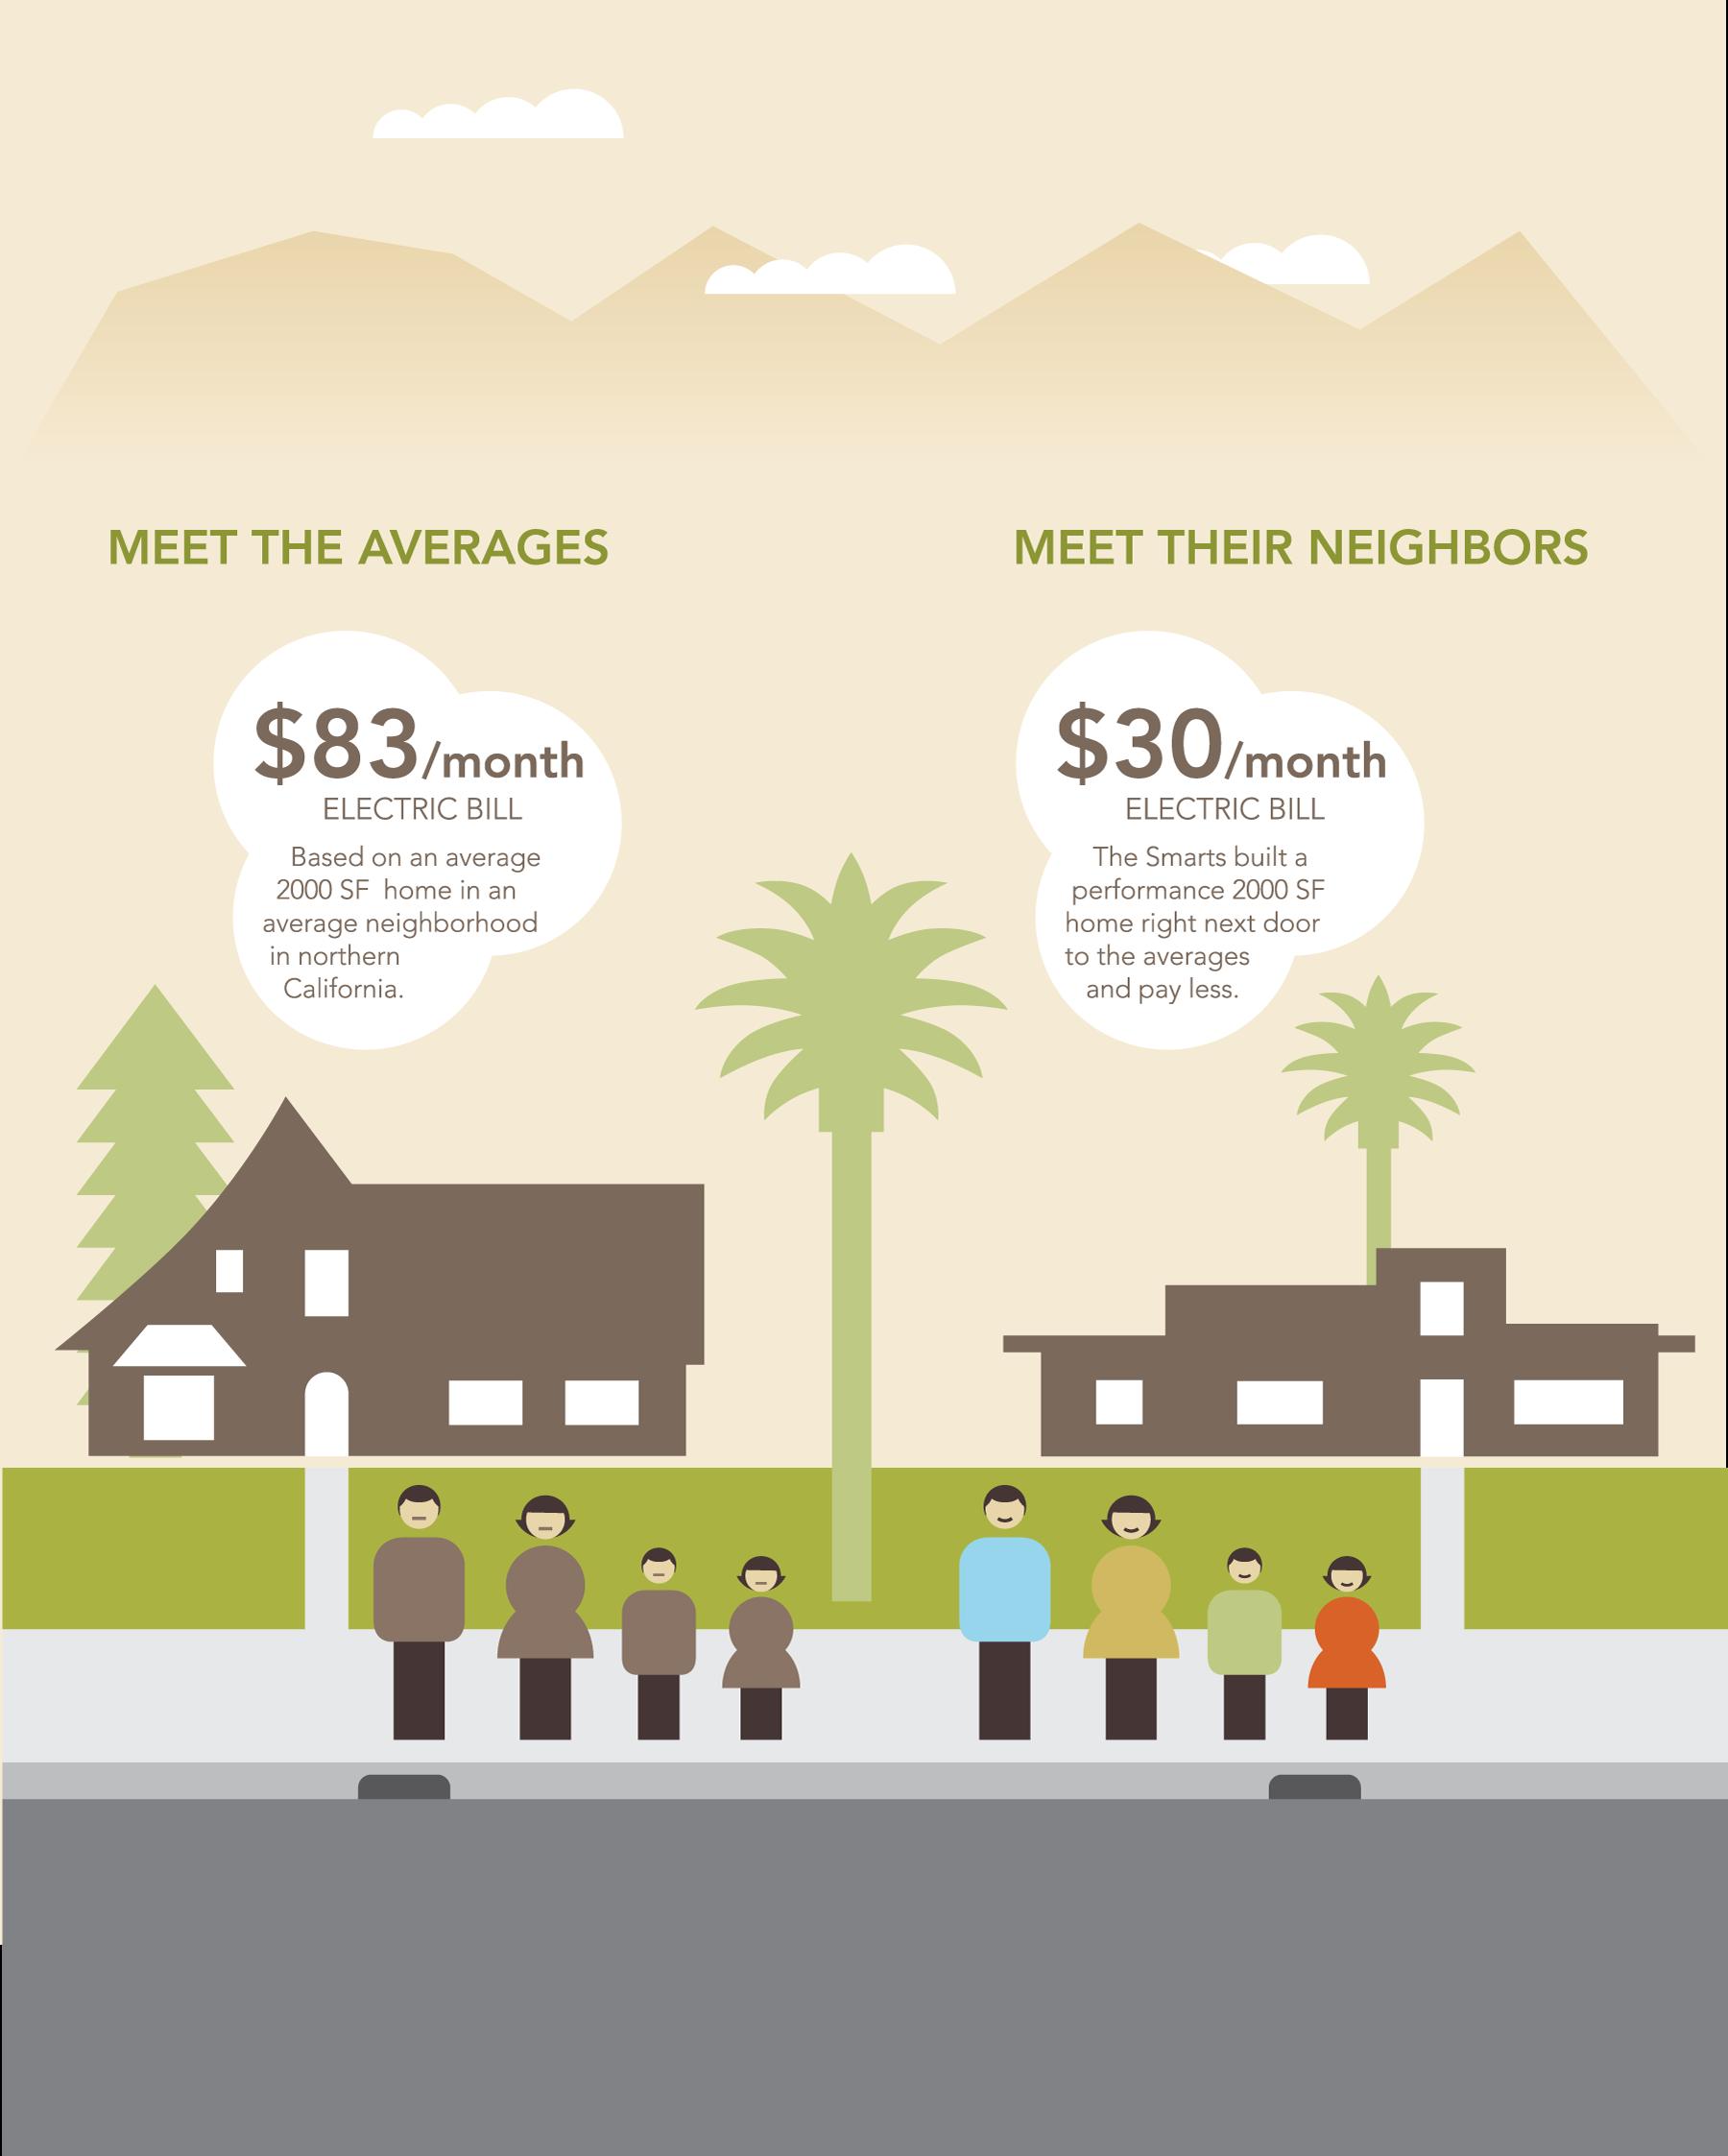 Electric bill savings illustration by Mark Mularz of Fetch Design.